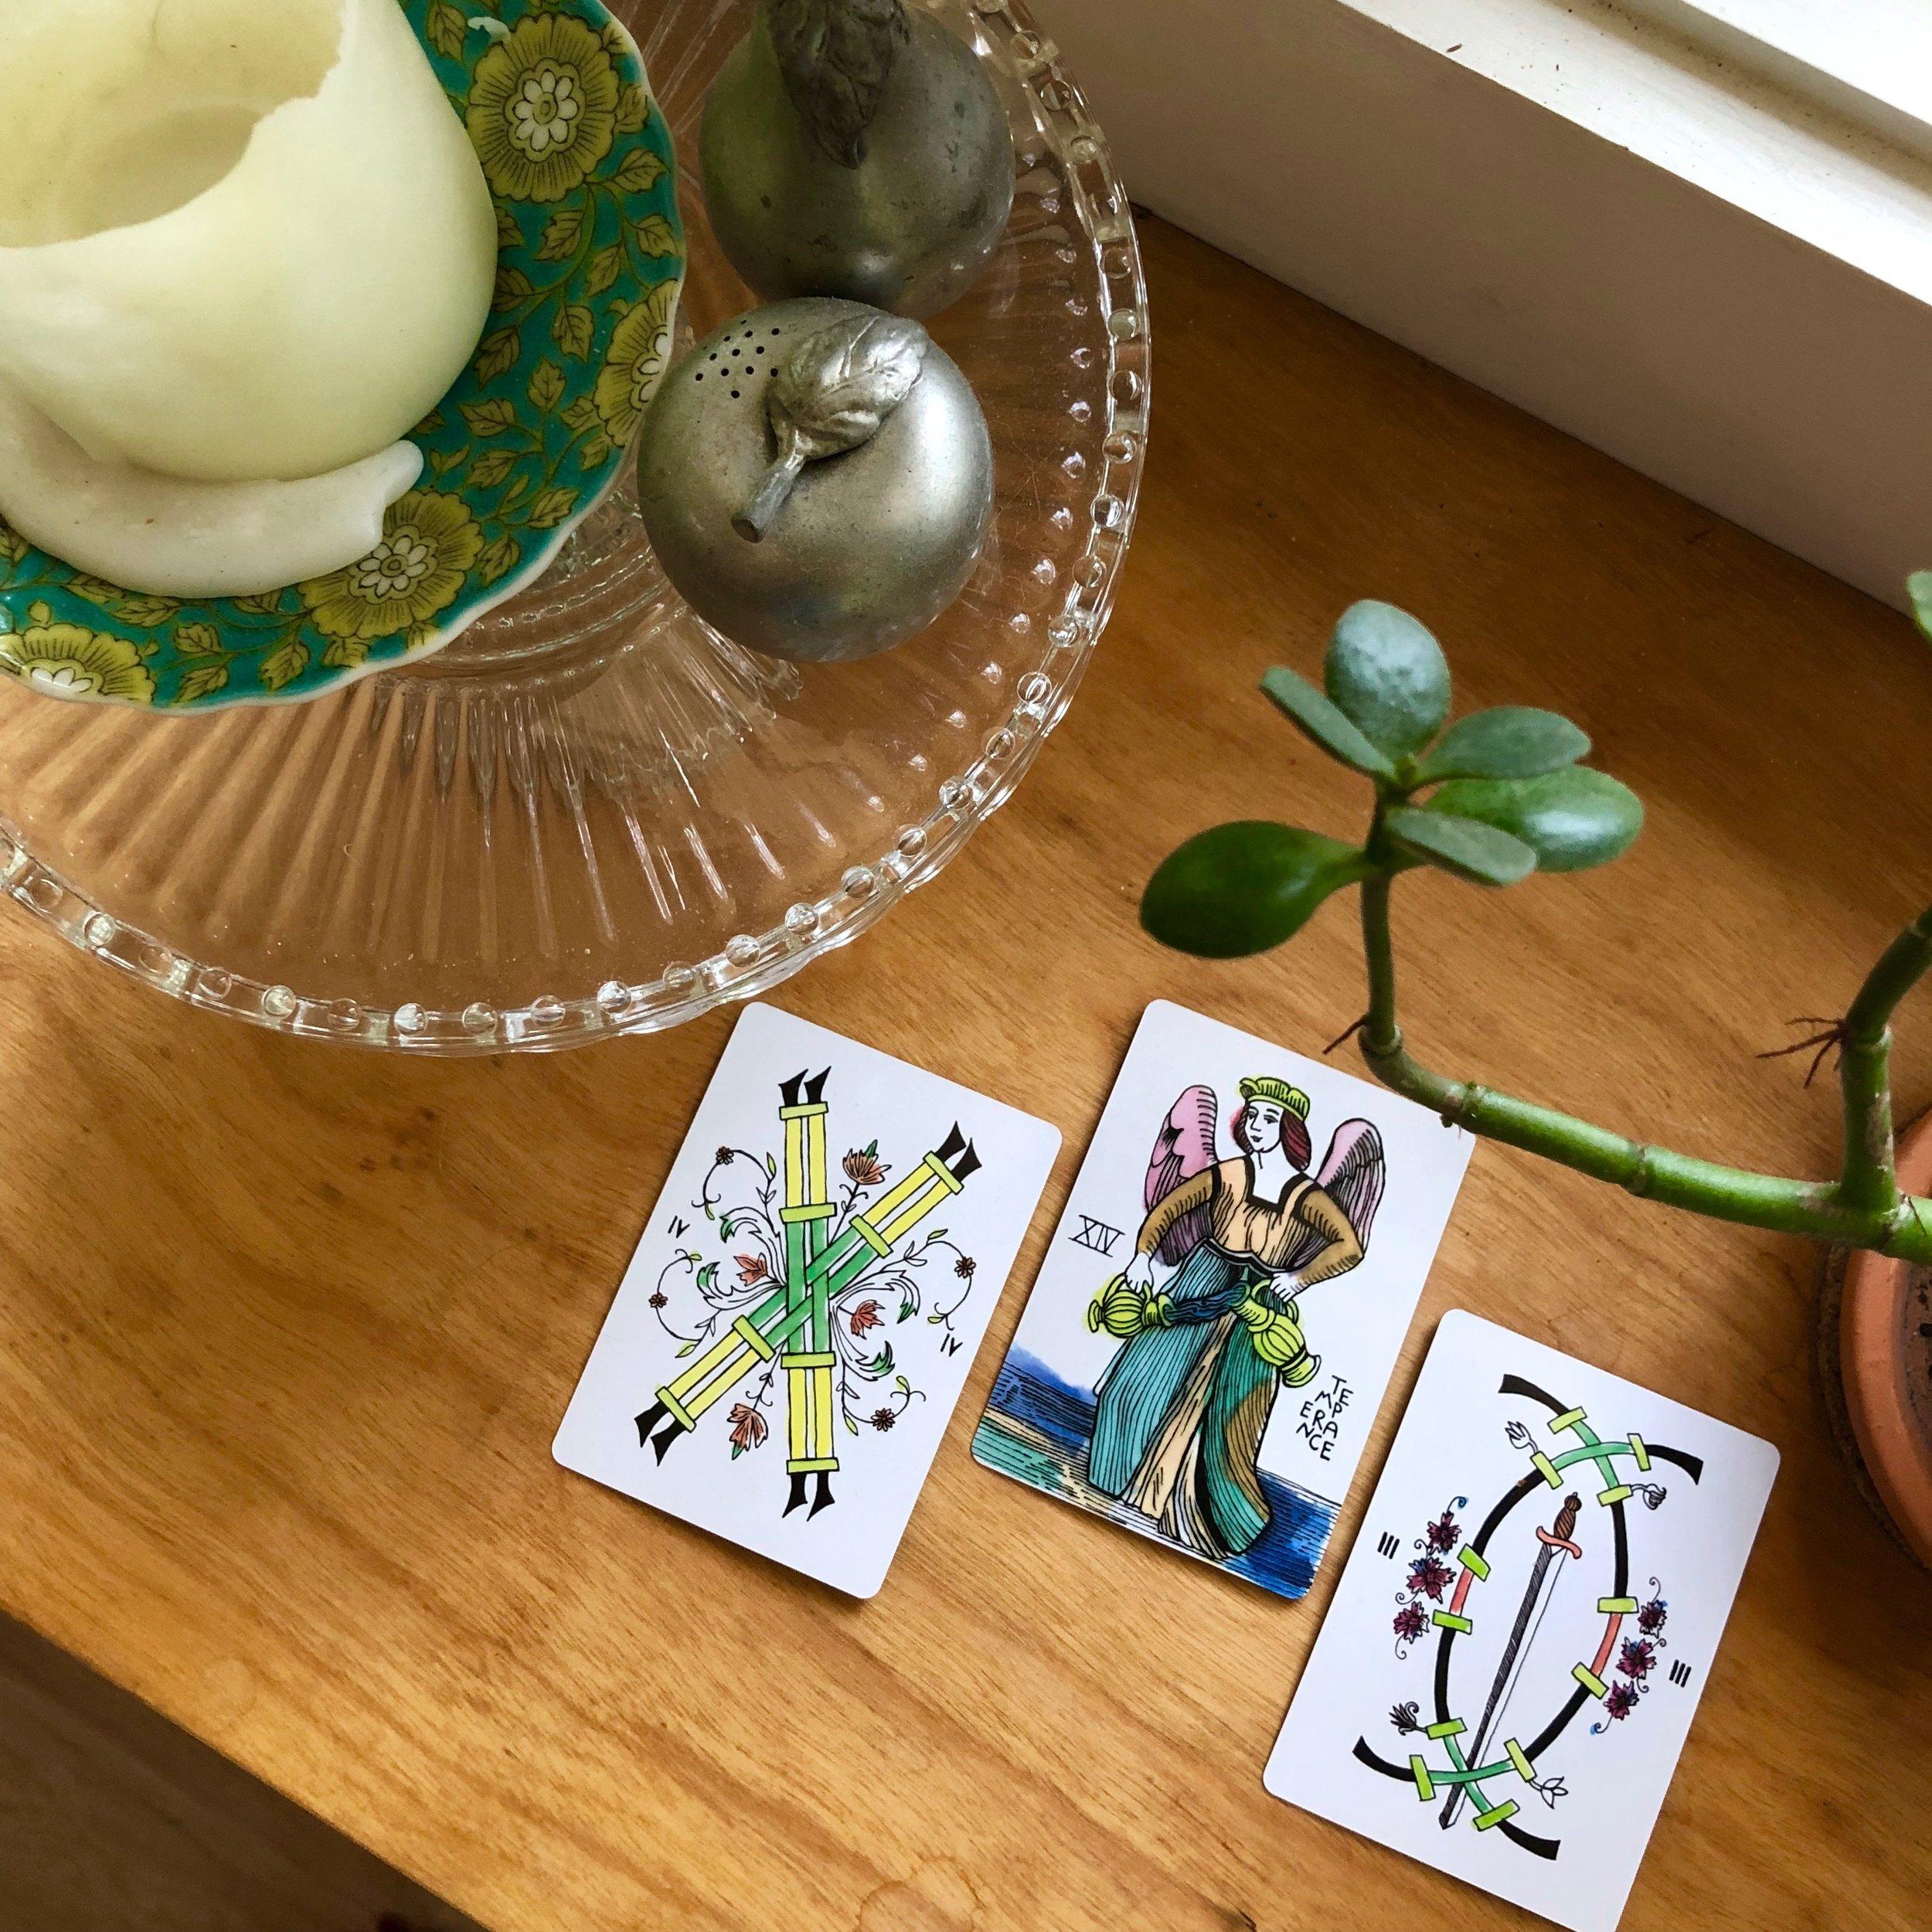 Three Card Reading Spirit Speak Apparation Tarot Deck Justice The Hermit Two of Swords